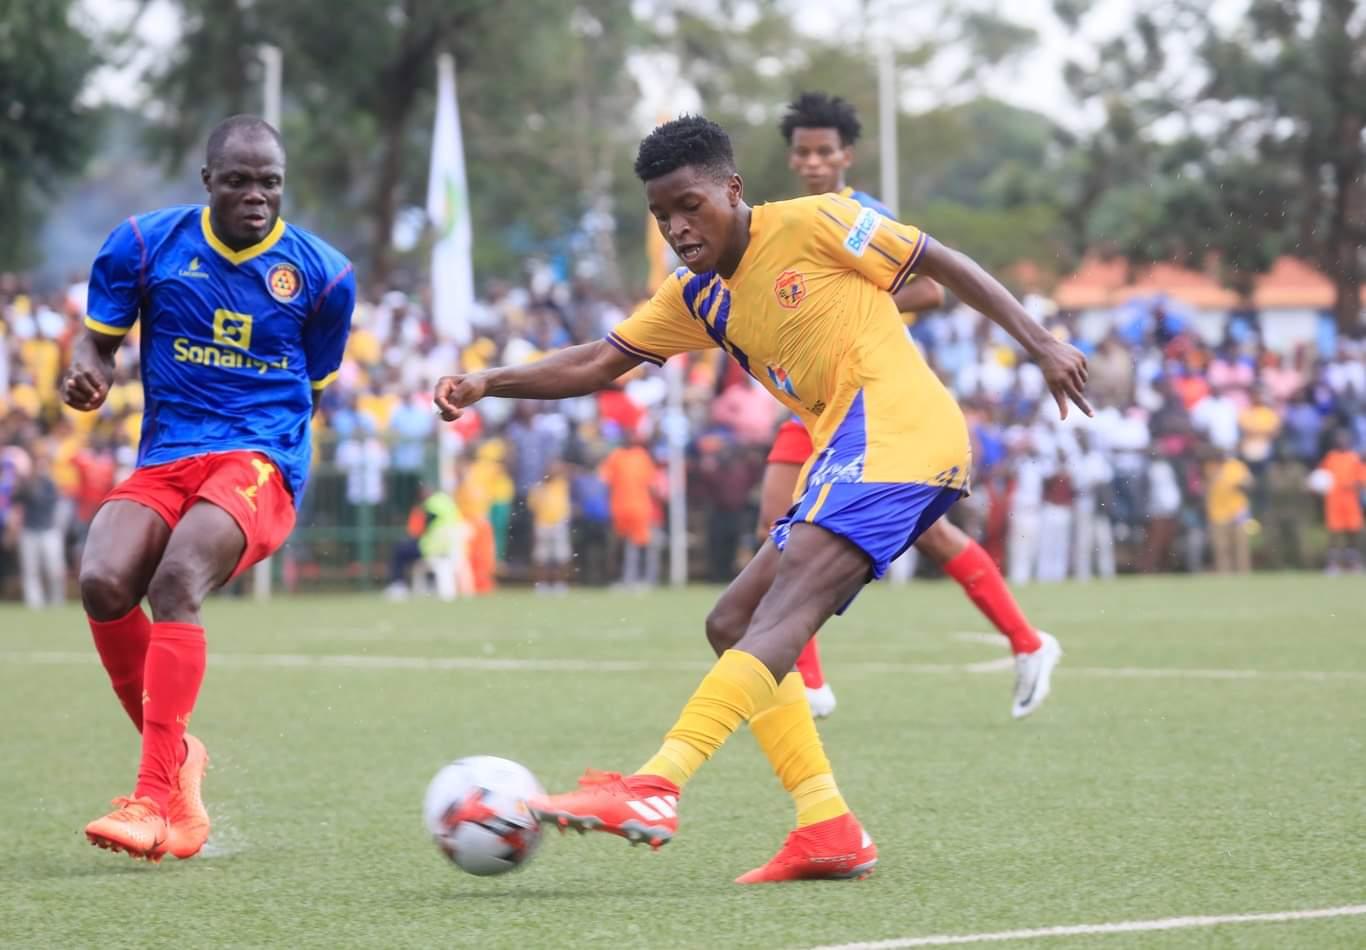 Allan Okello shoots the ball during the game against Petro de Luanda on Friday.